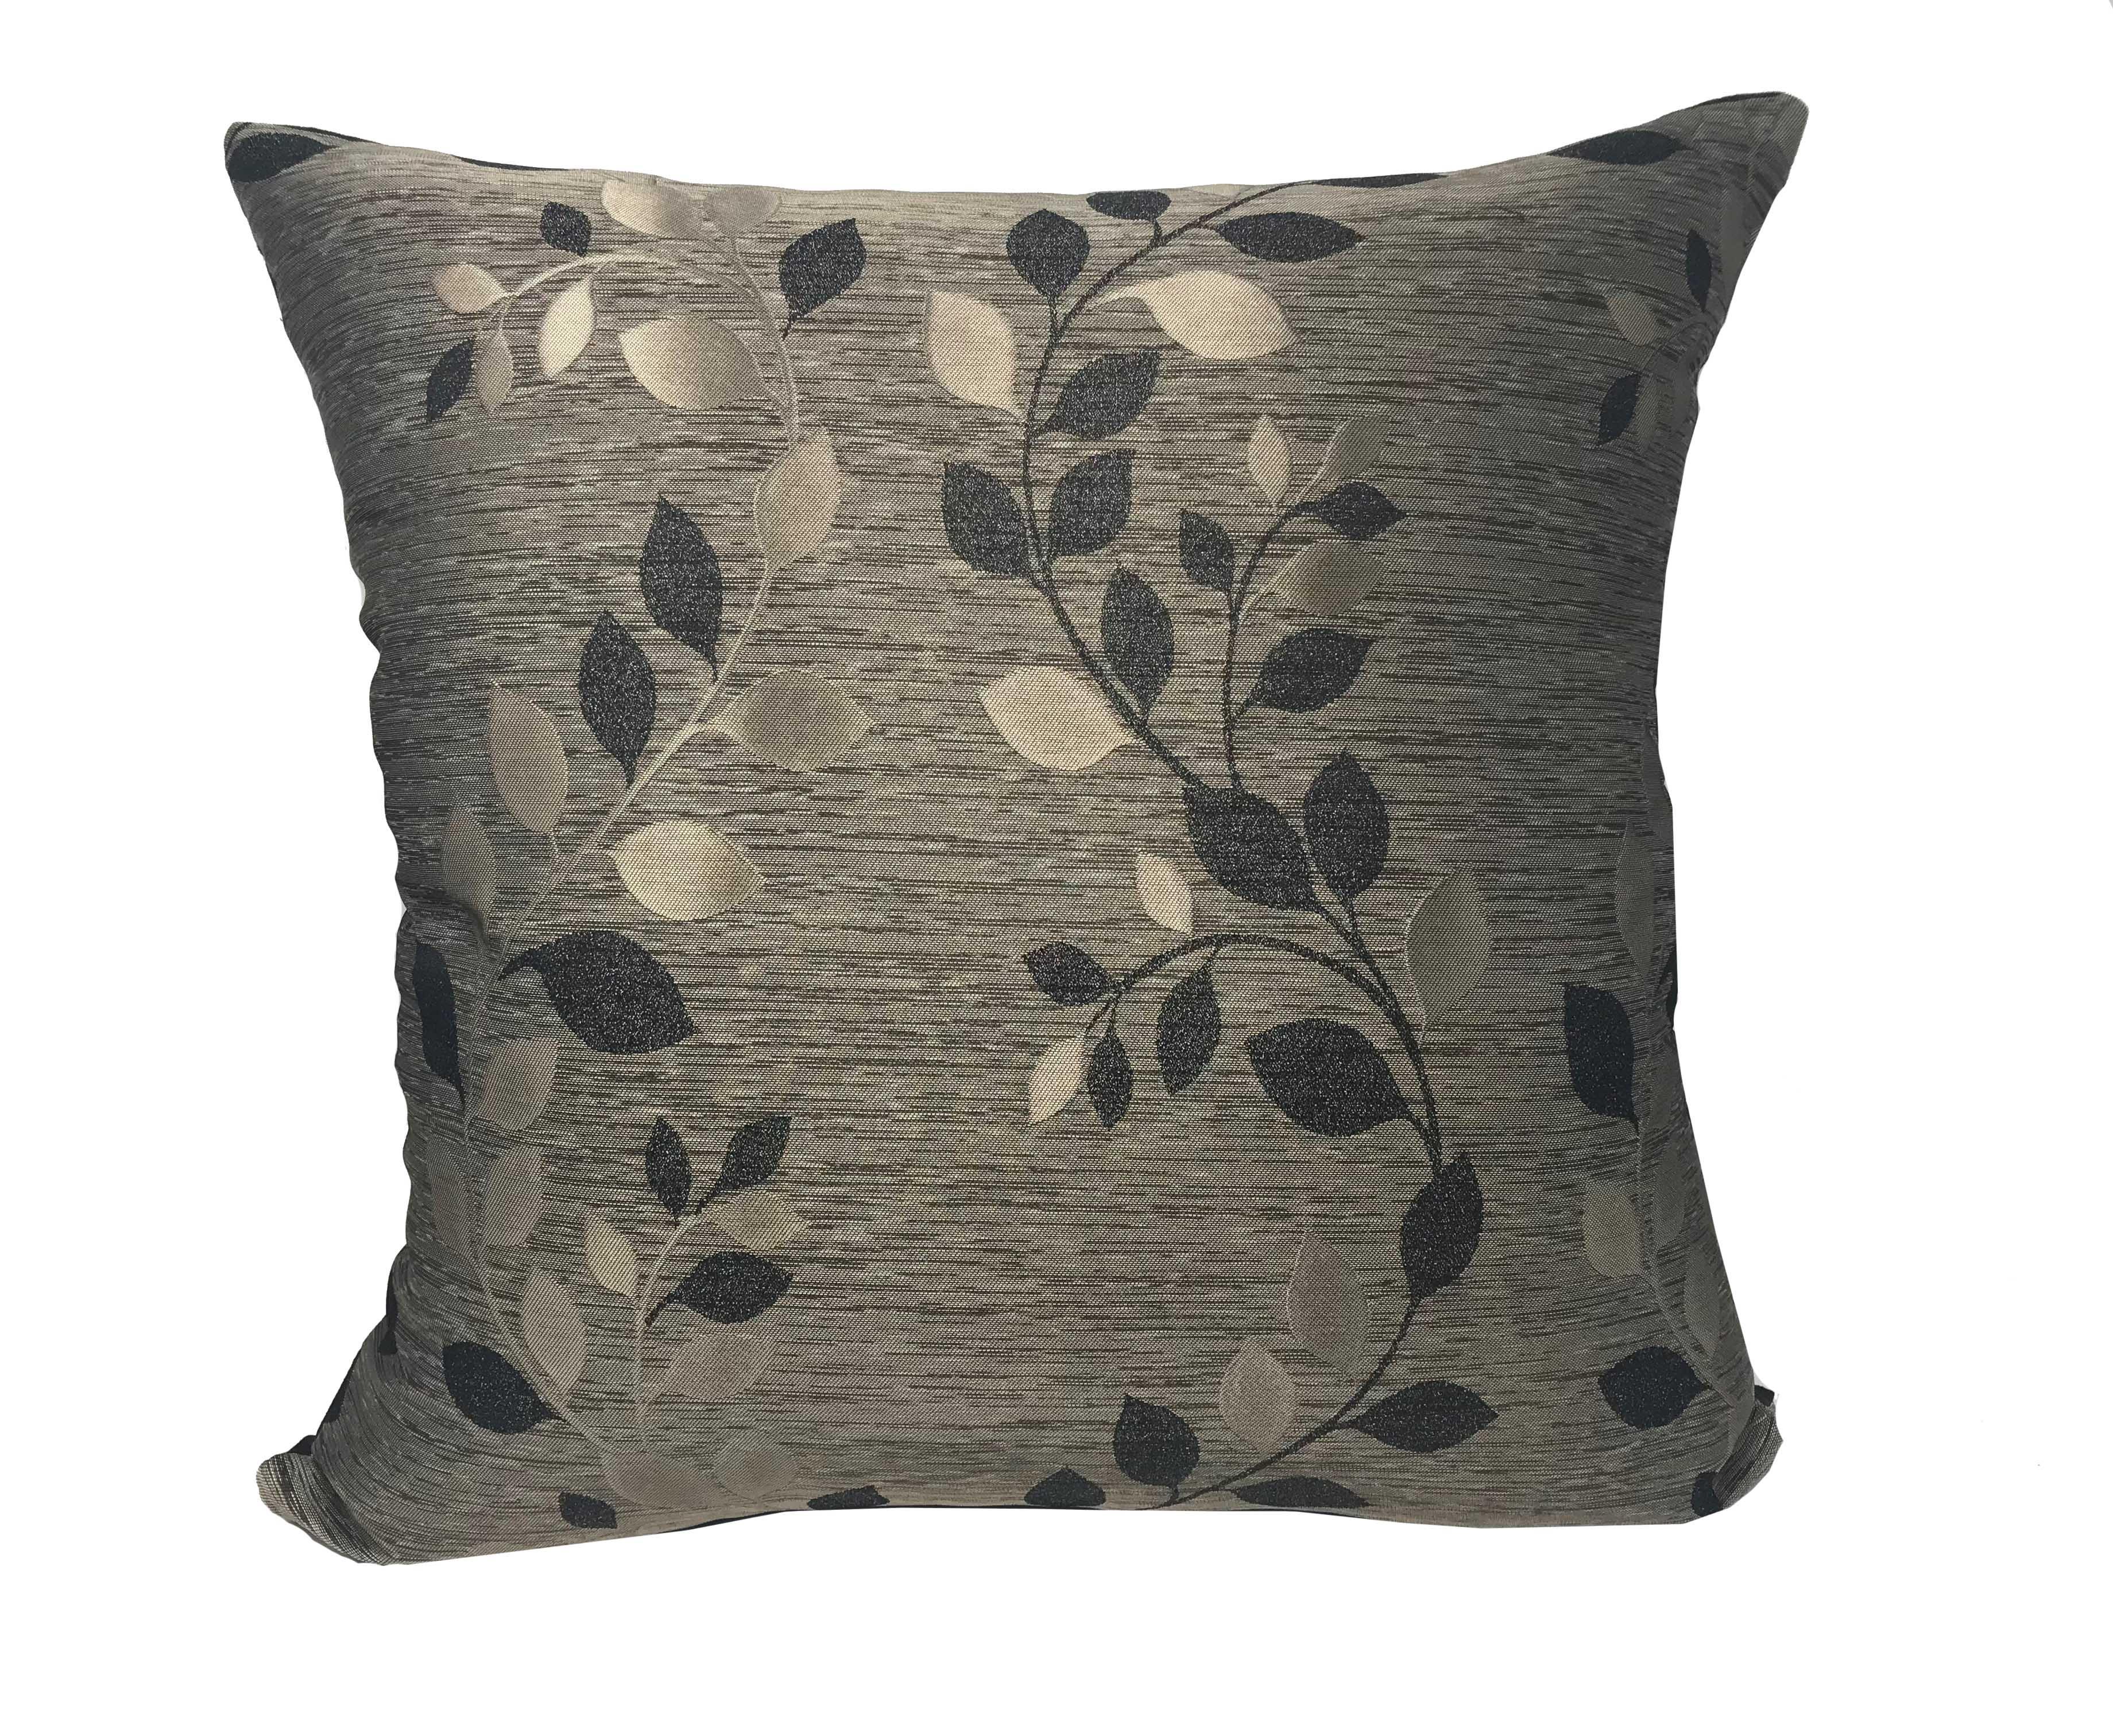 Palma Black 55cm x 55cm Cushion Cover Only